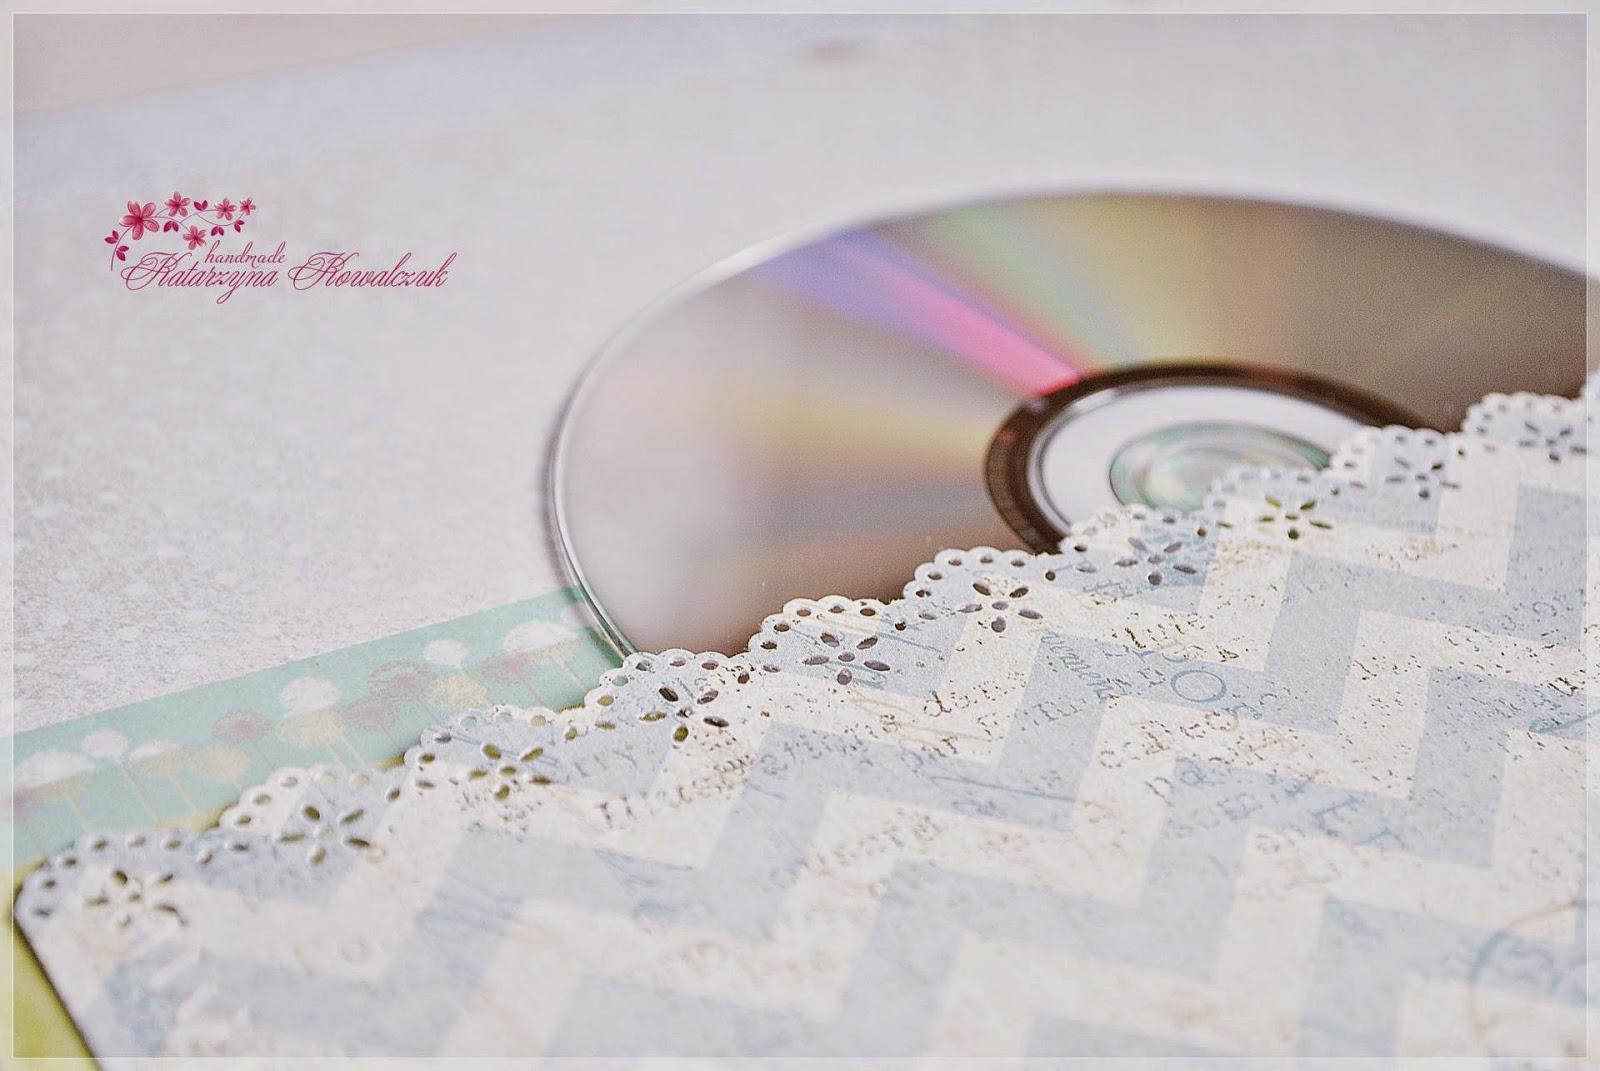 Pamiątka Chrztu Świętego - Album scrapbooking